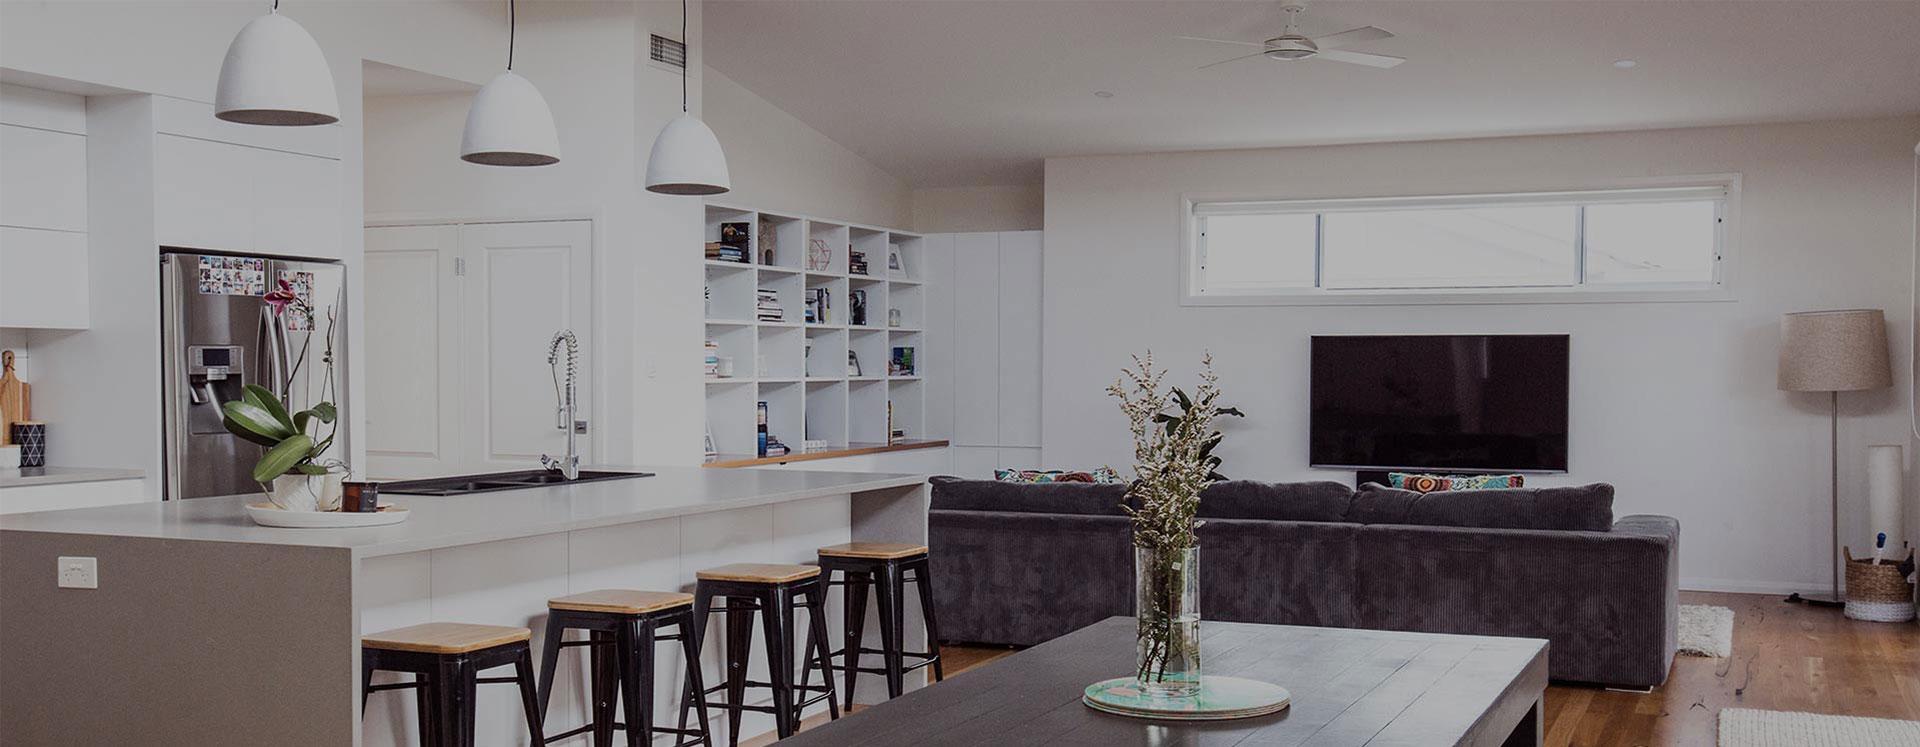 Etchells Home Design Central Coast